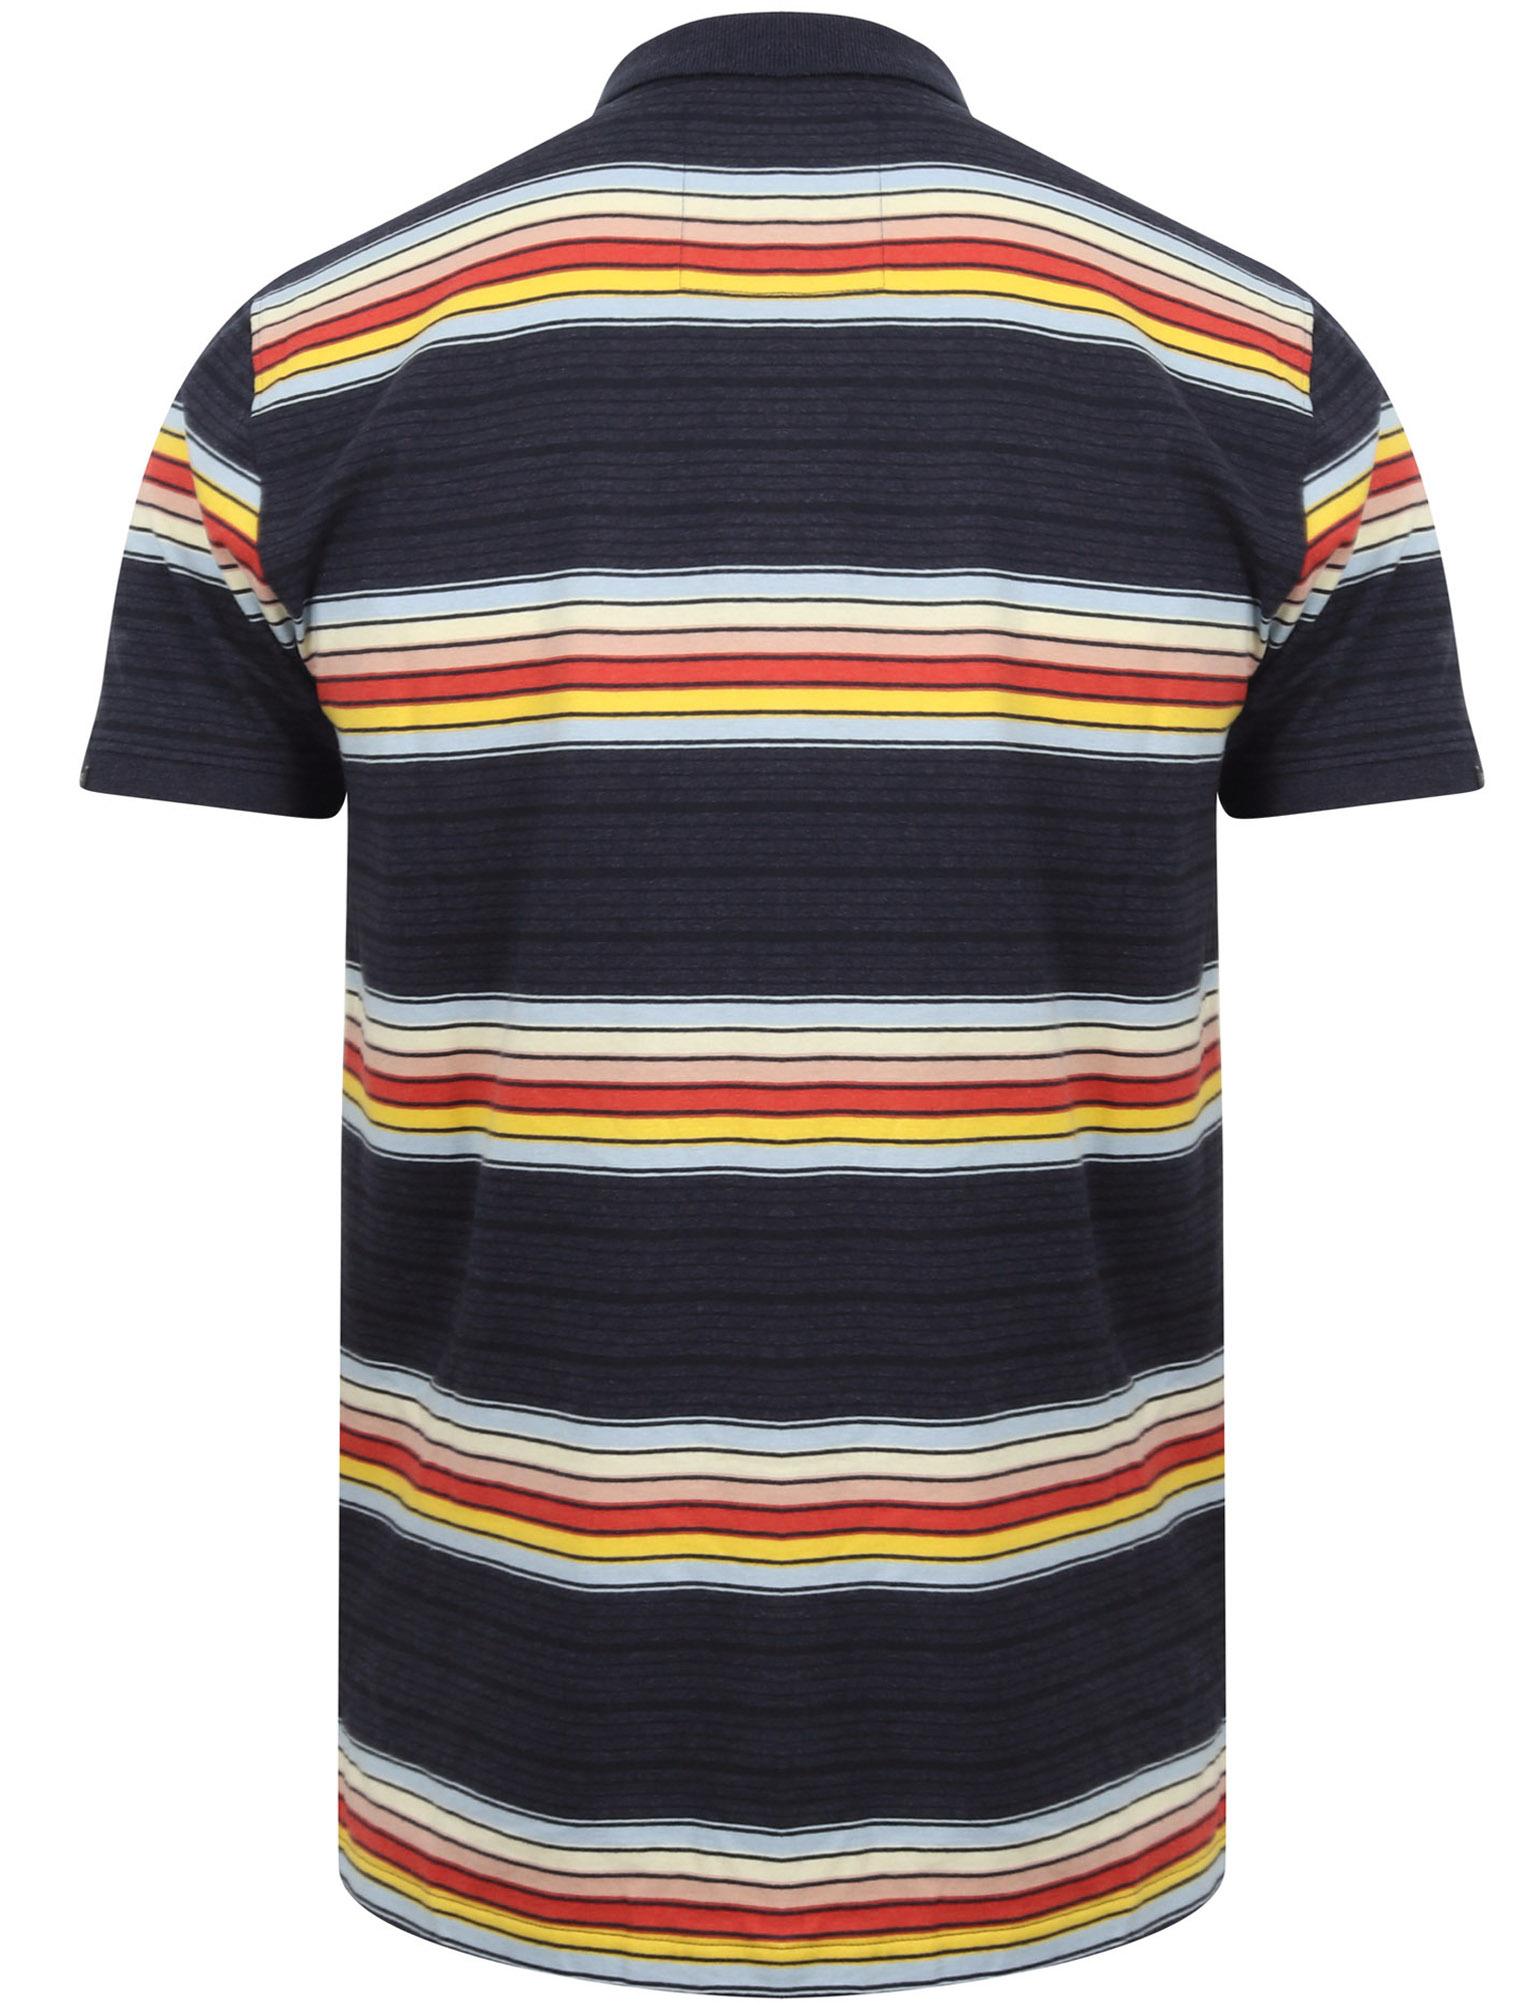 Tokyo-Laundry-Men-039-s-Bakersfield-Striped-Polo-Shirt-Stripy-Retro-Vintage-T-Shirt thumbnail 5